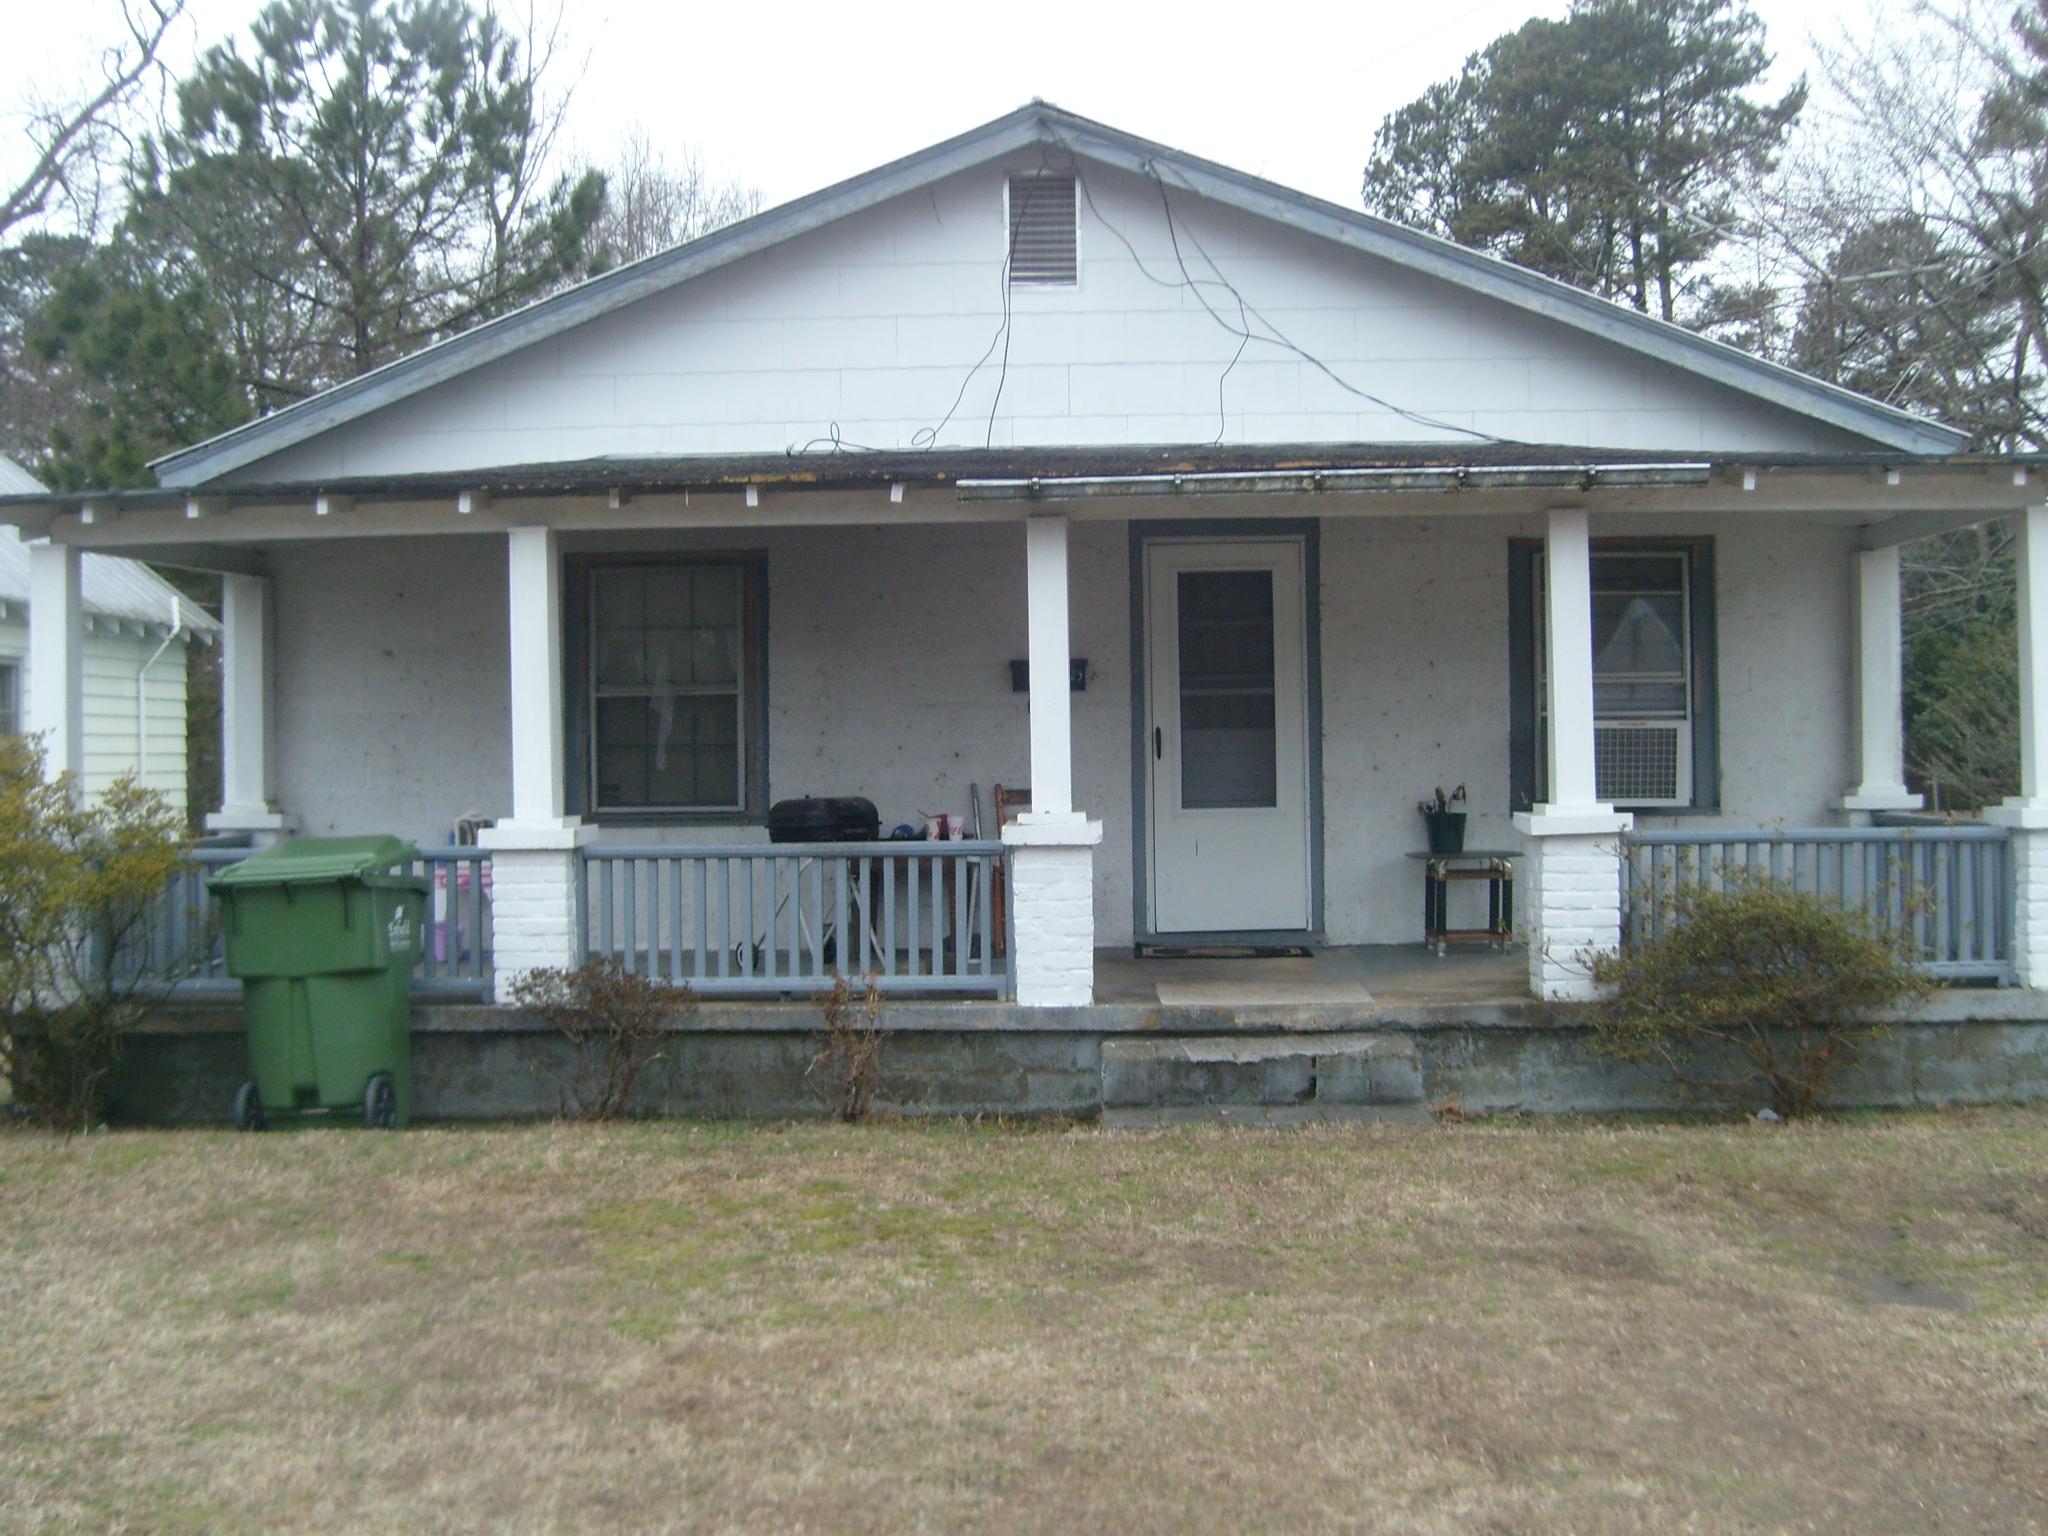 329 BRANCH STREET, Enfield, North Carolina 27873